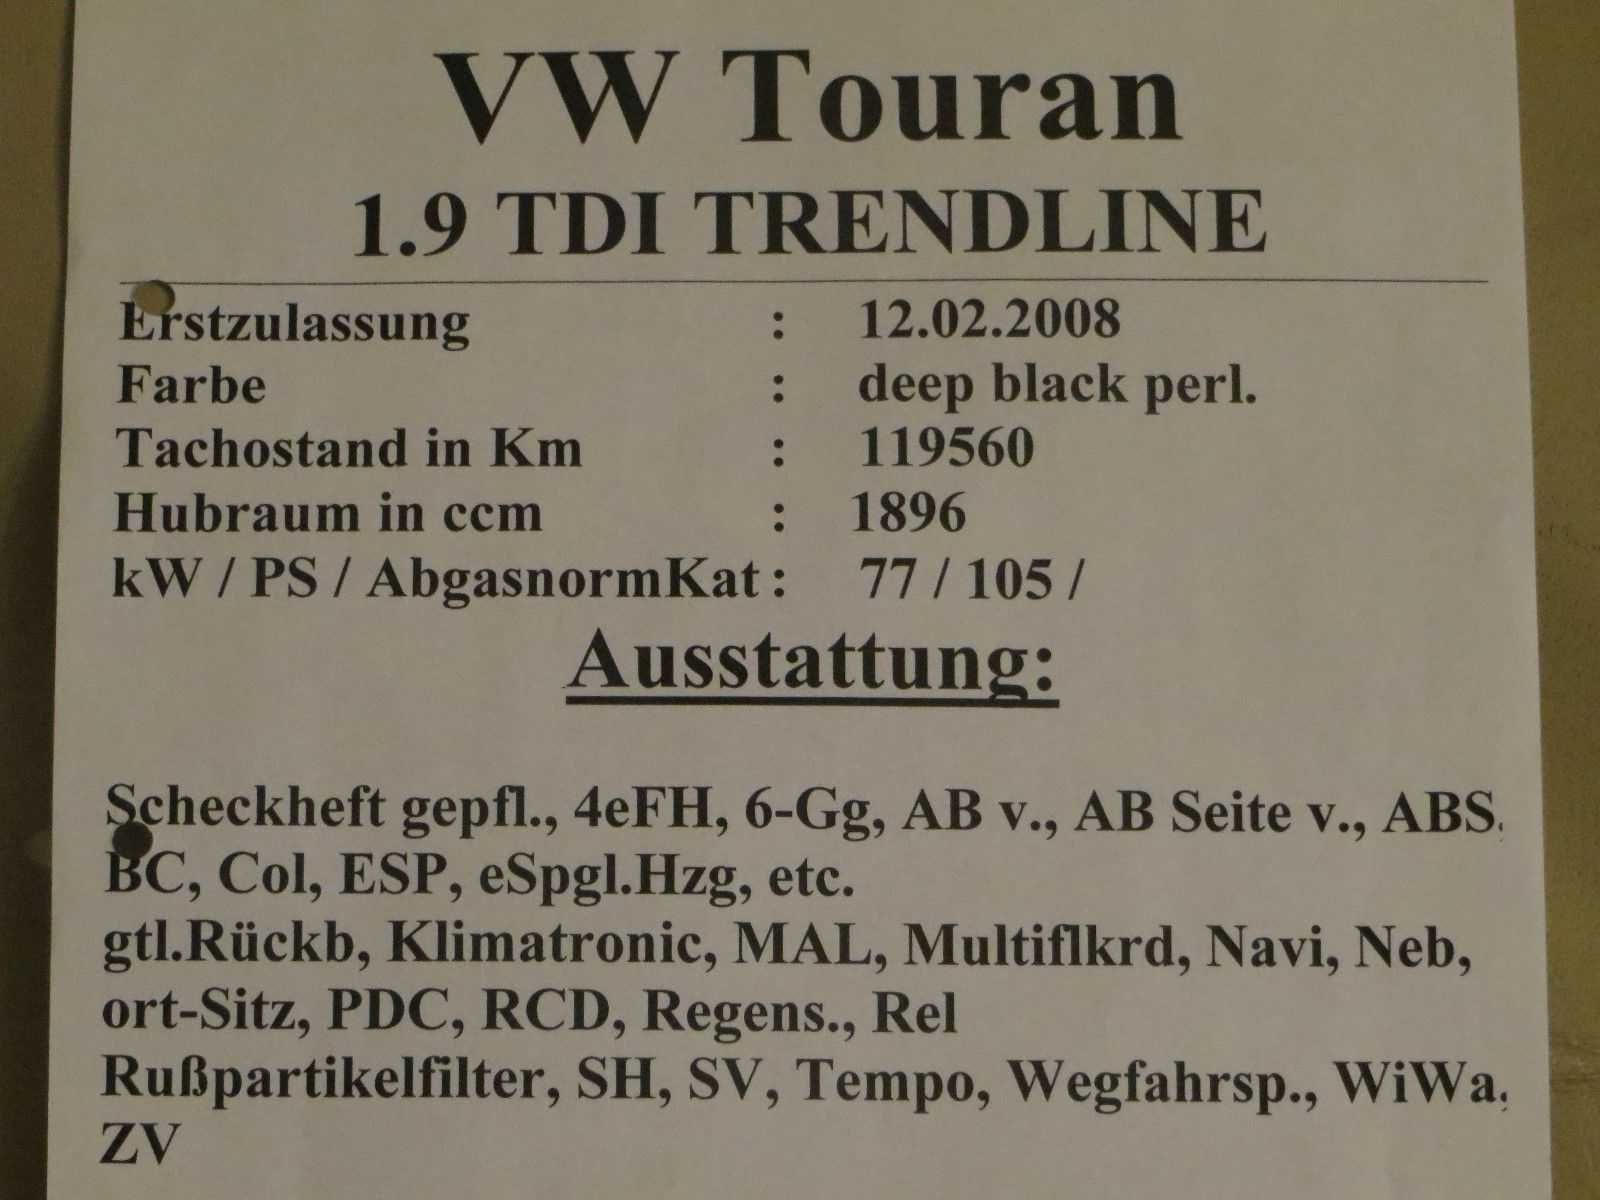 VW Touran 1,9TDI EZ 2008 fahrüchtig angemeldet Pfeifgeräusche ...